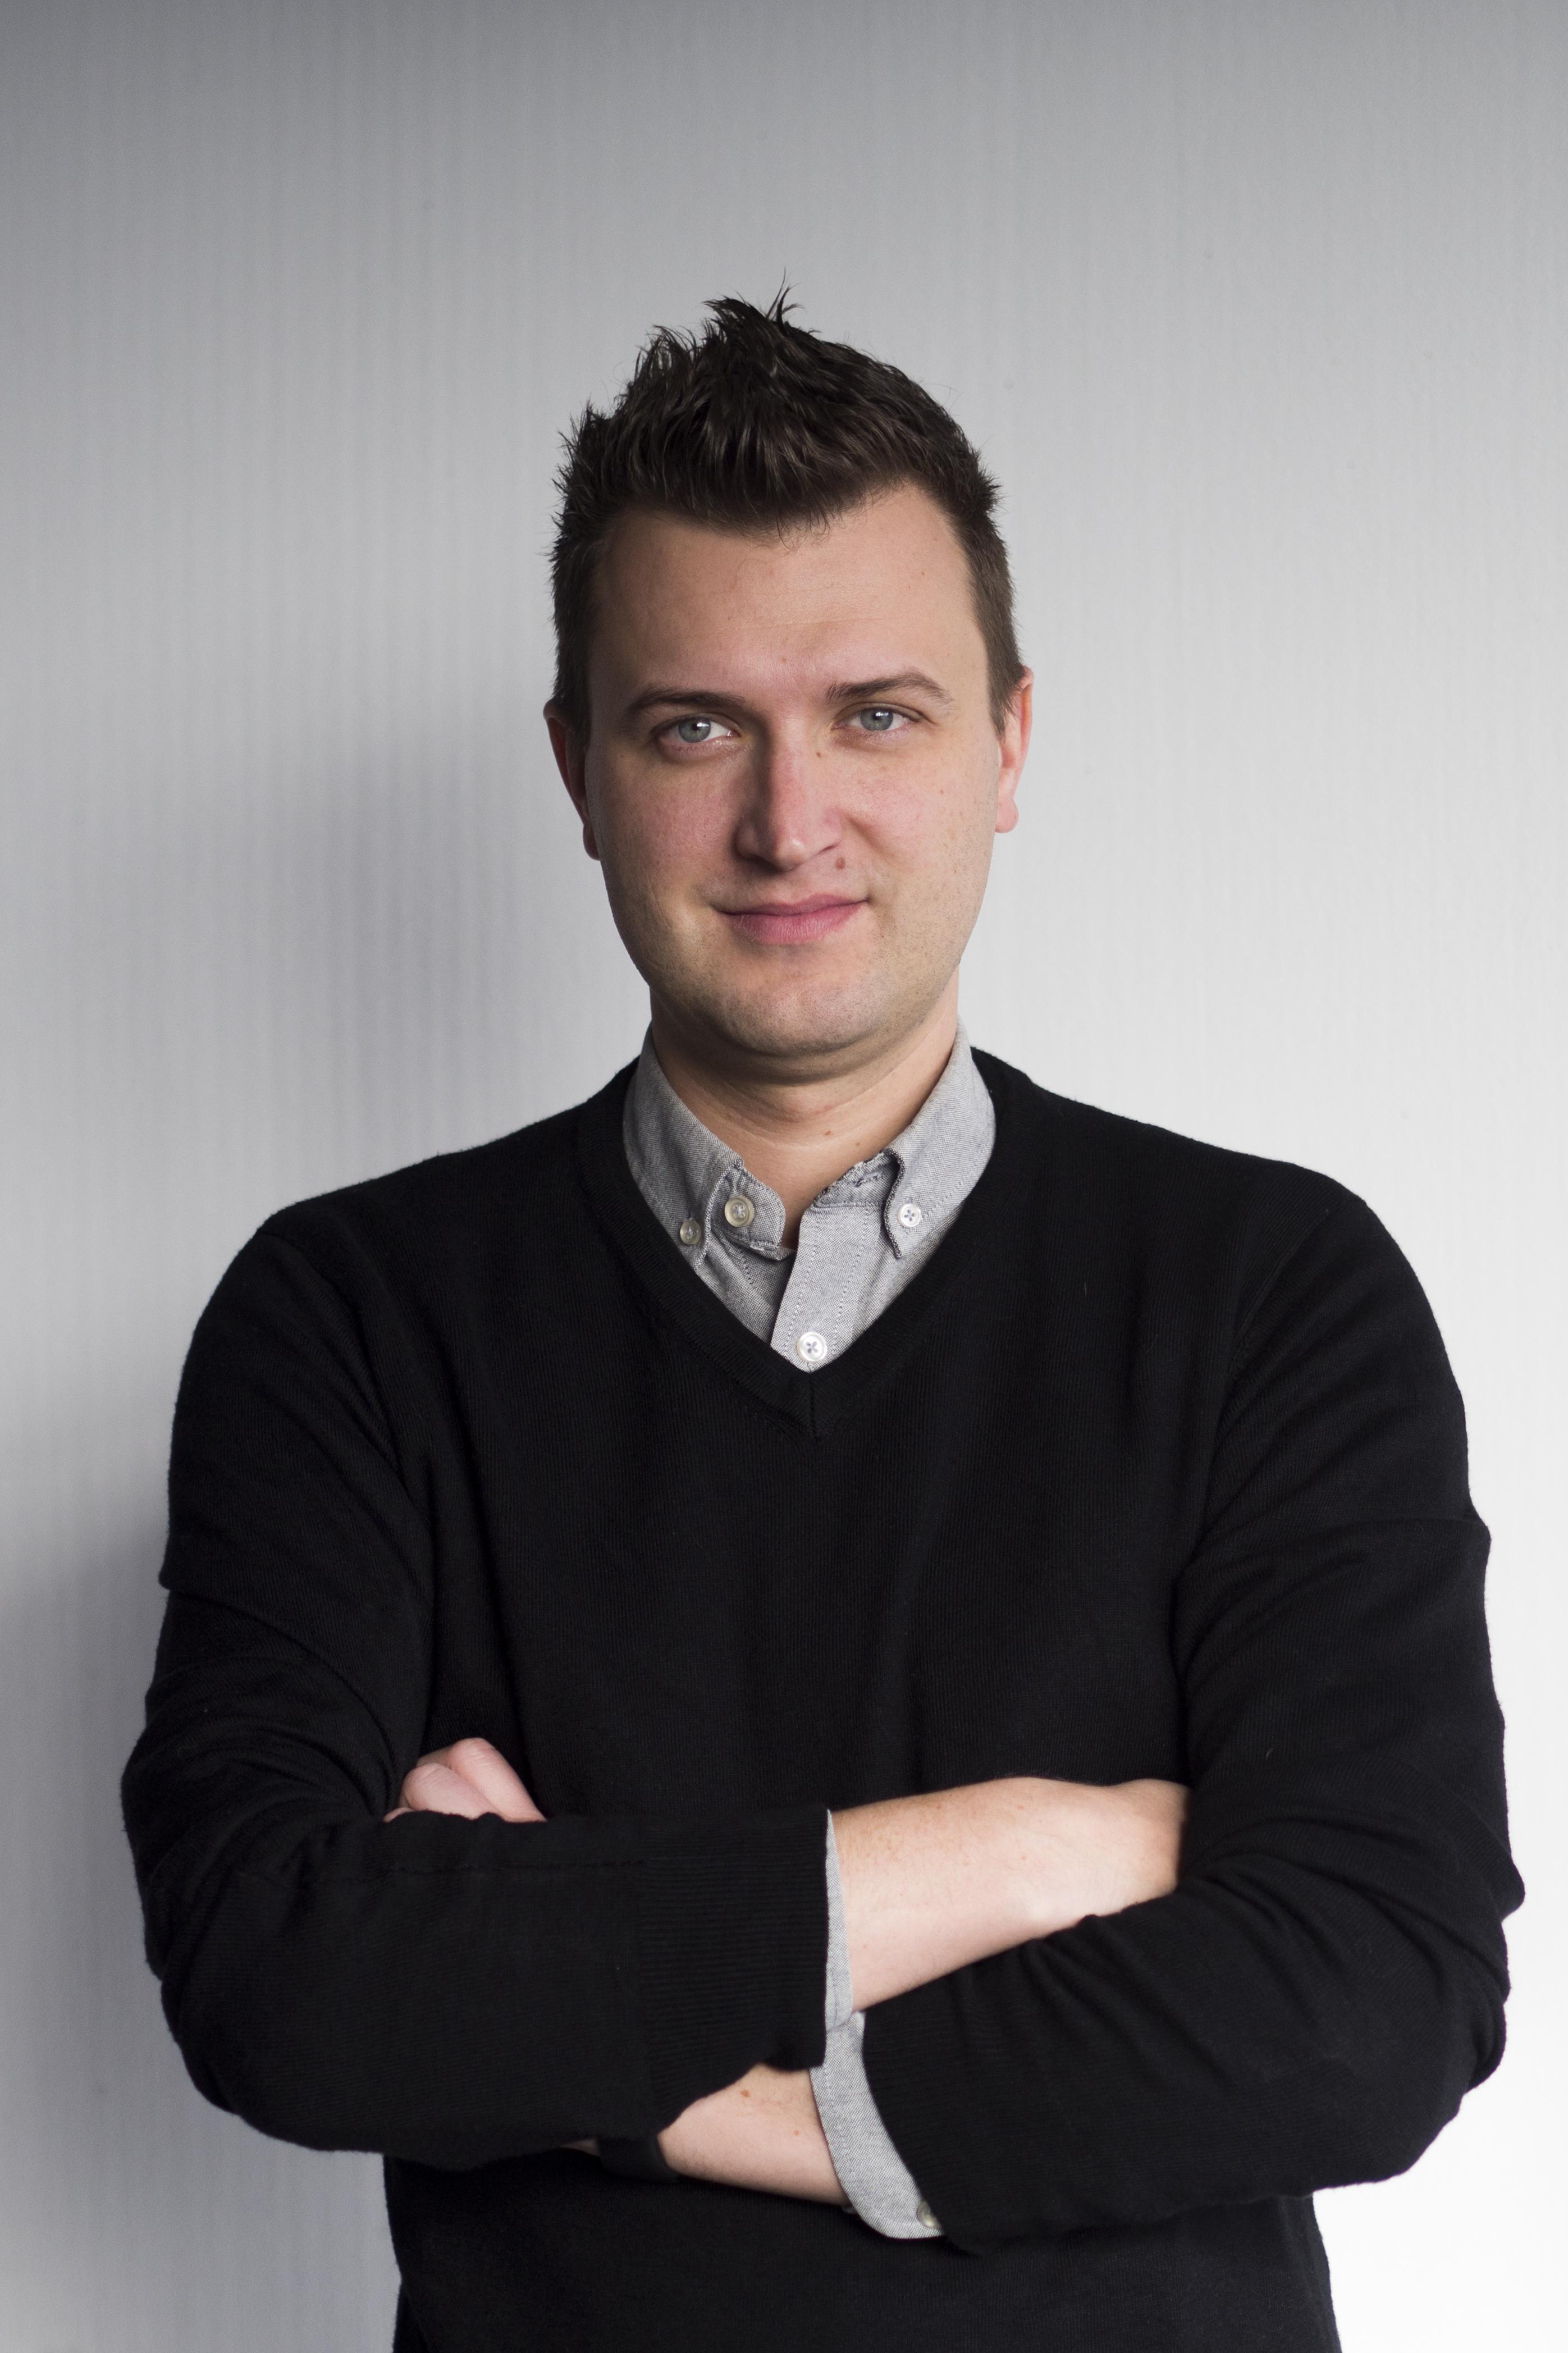 Francois Renaud